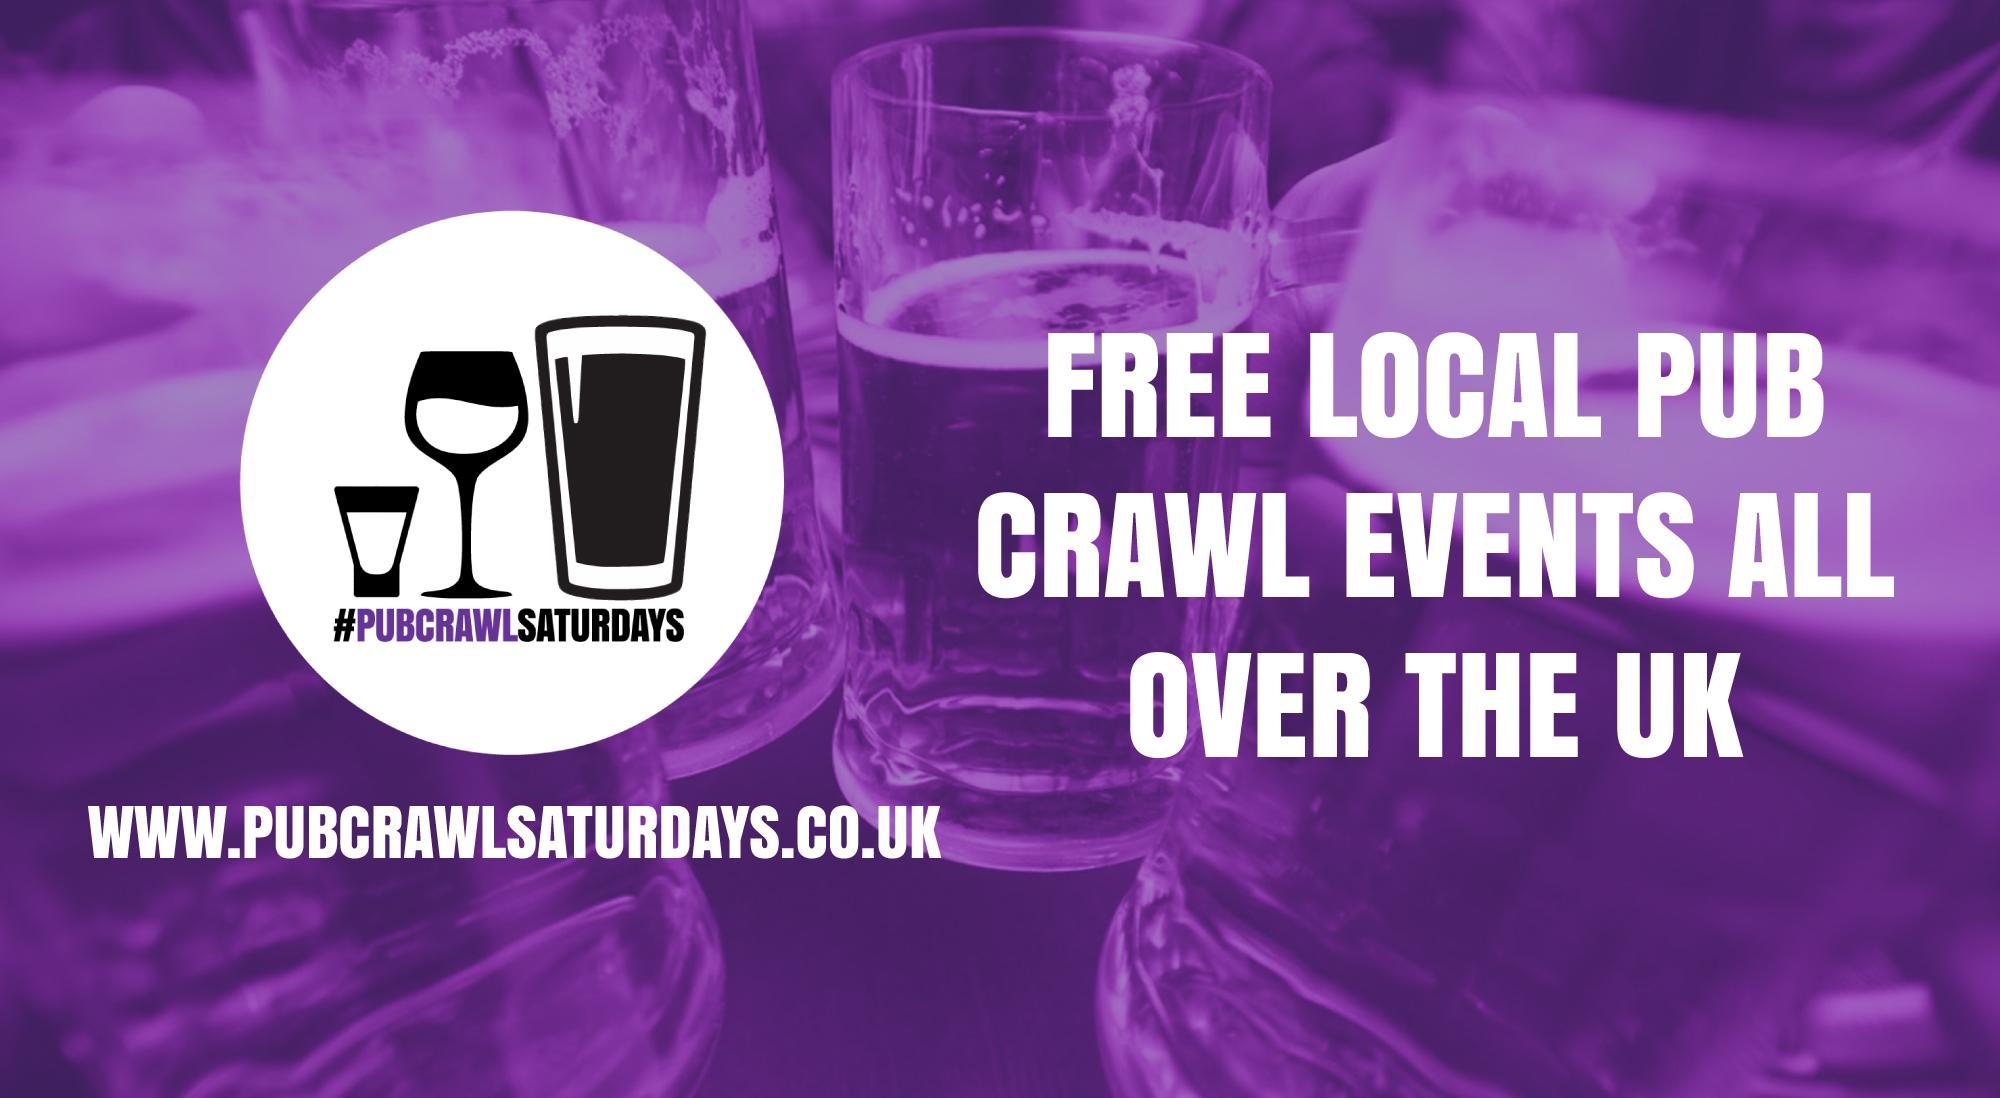 PUB CRAWL SATURDAYS! Free weekly pub crawl event in Dorchester